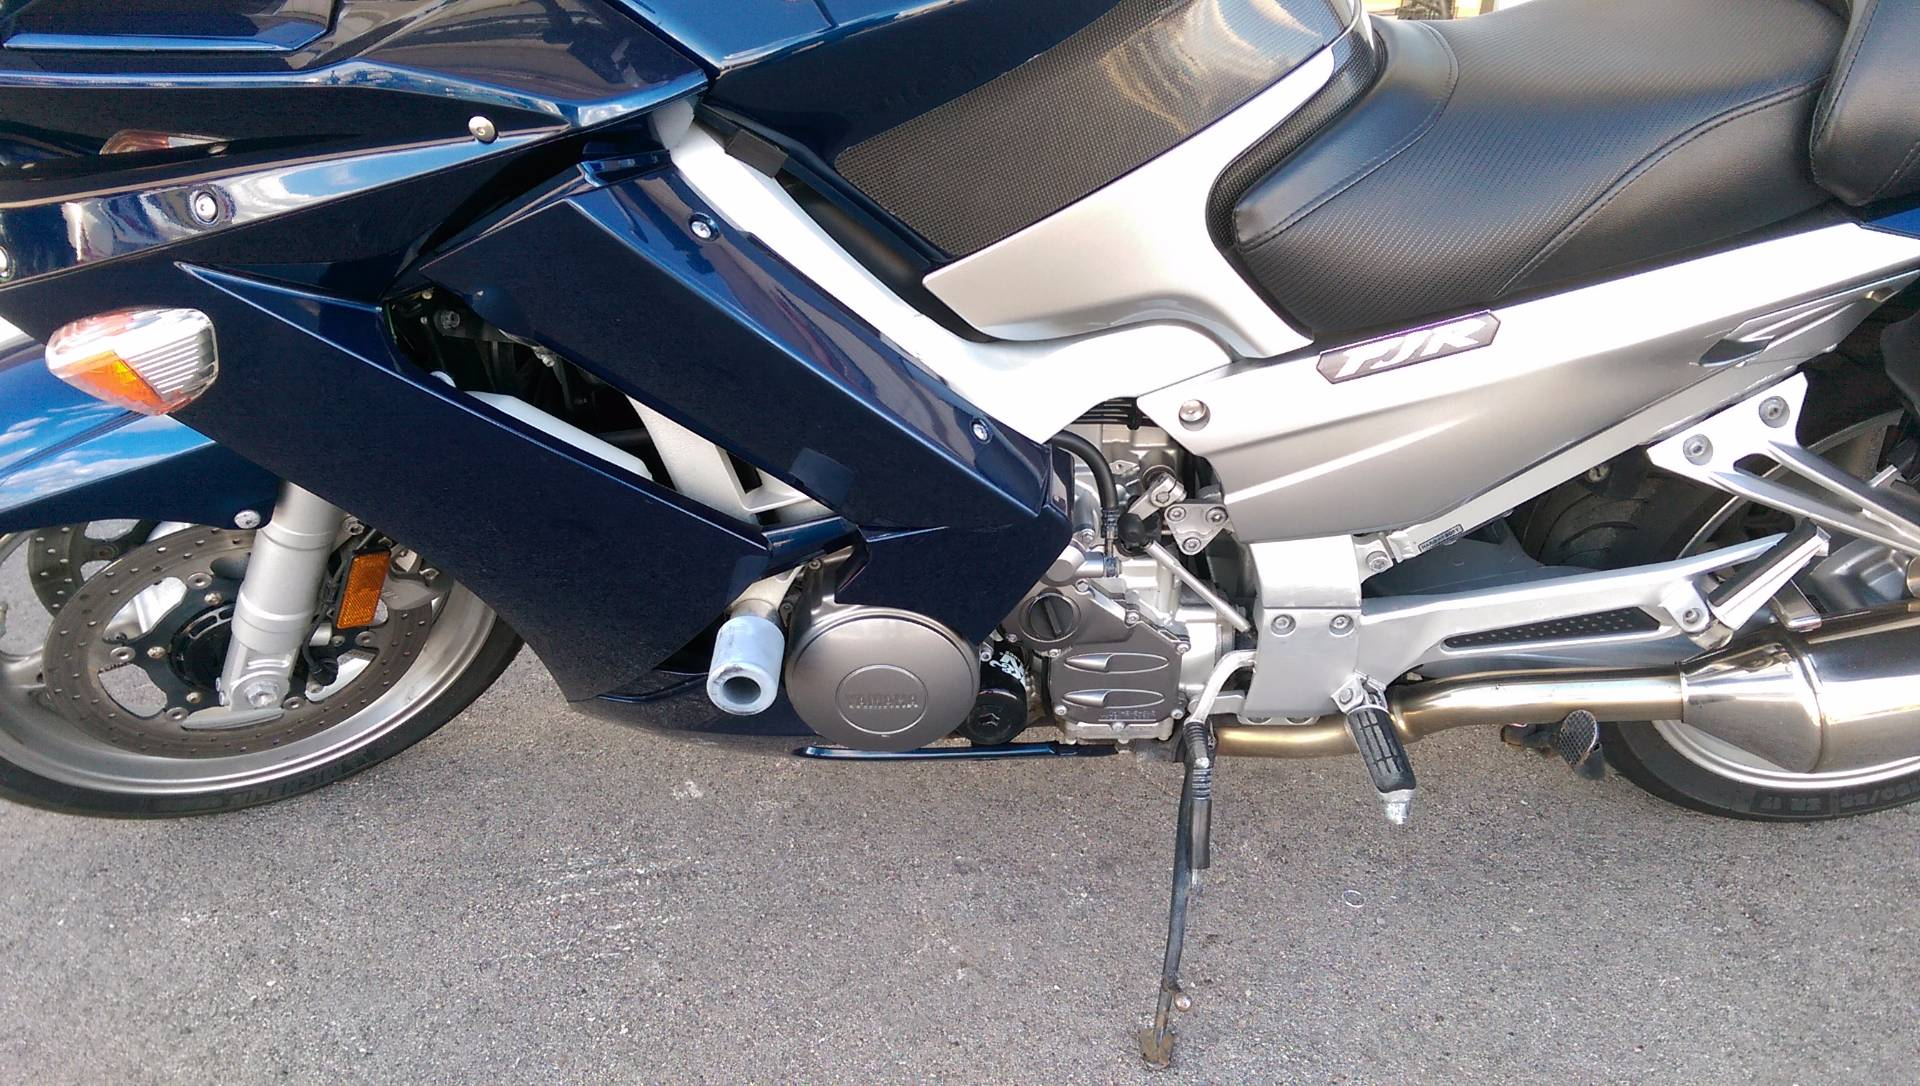 2006 Yamaha FJR 1300A 5